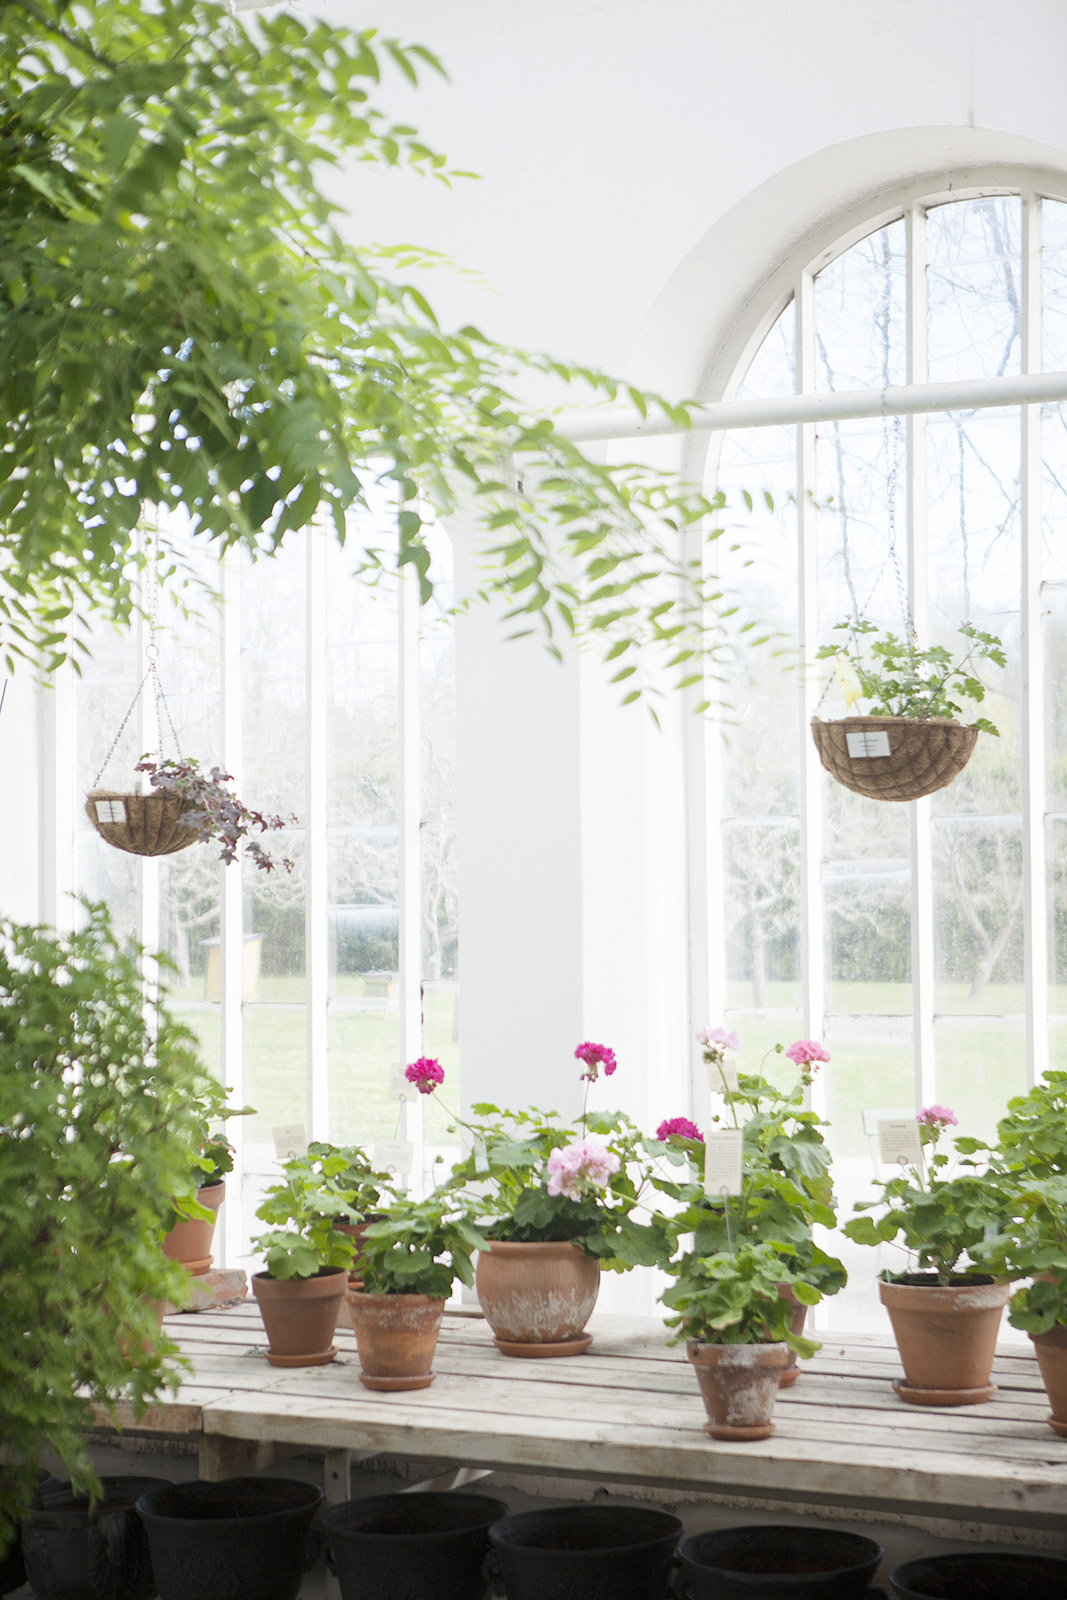 Amelie von Essen, Julita växthus, julita gård, familjeutflykt, trädgård, vackra orangerier.